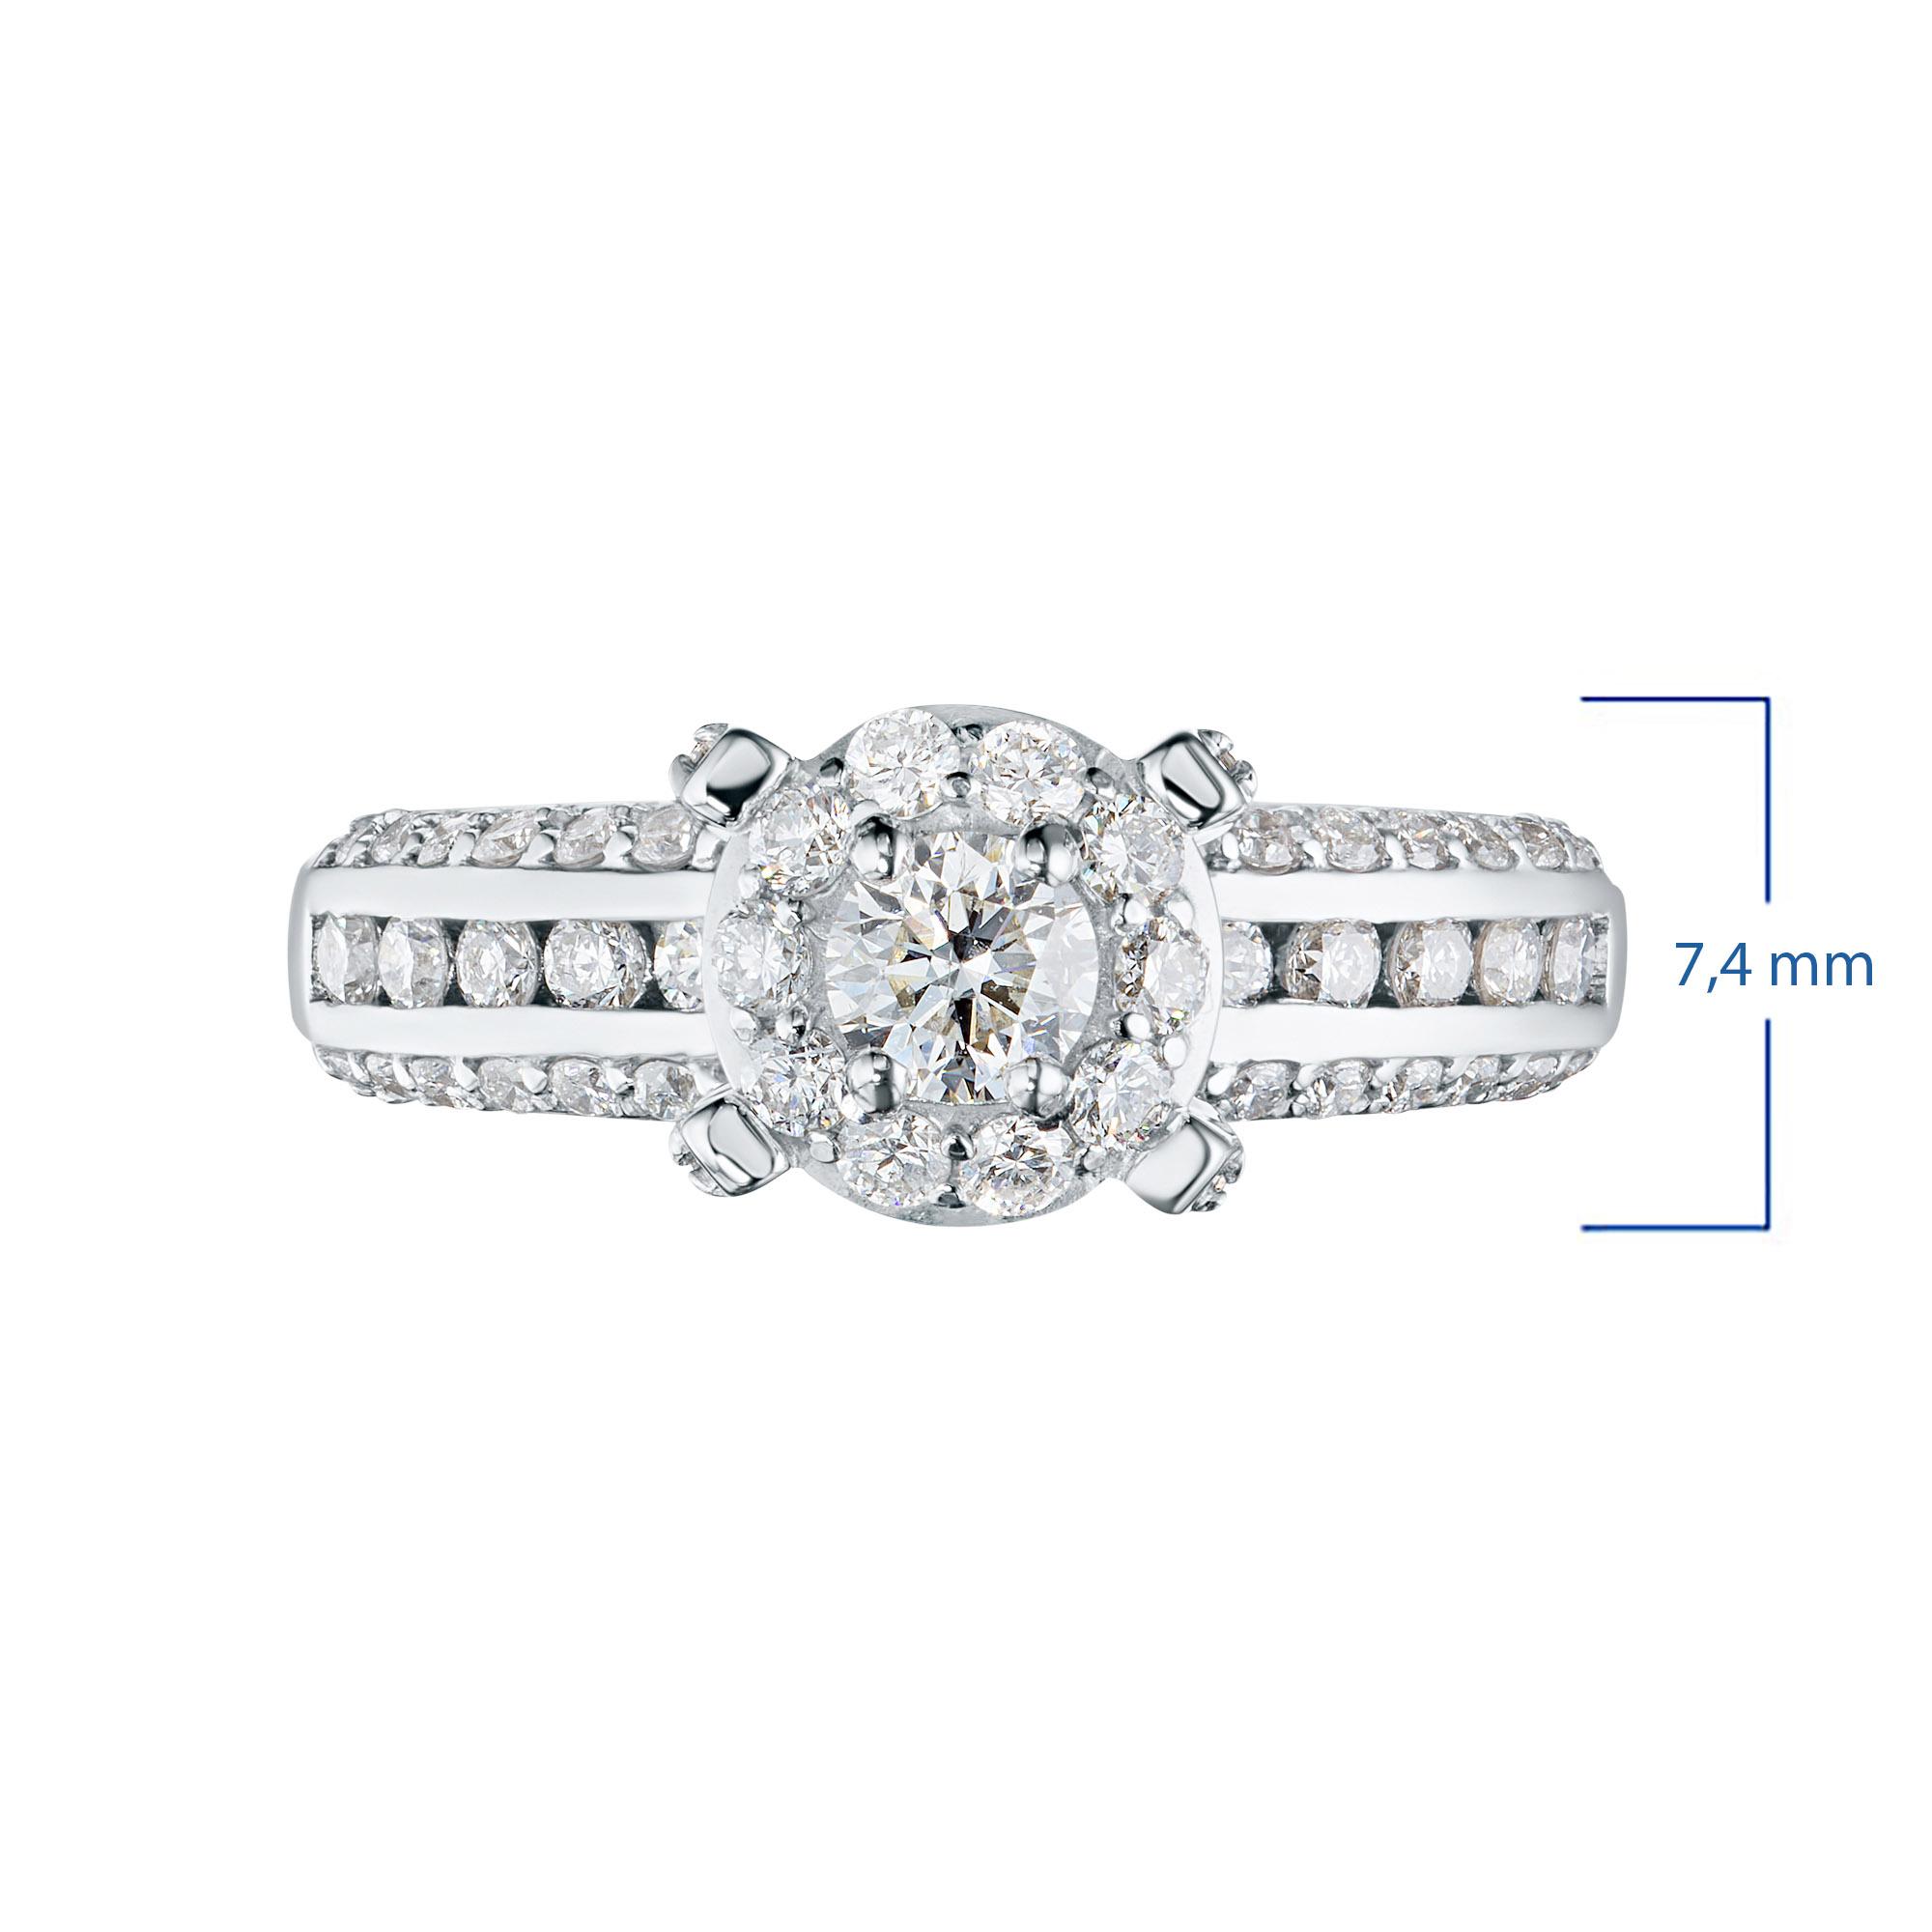 Кольцо из золота с бриллиантами э0901кц042103782